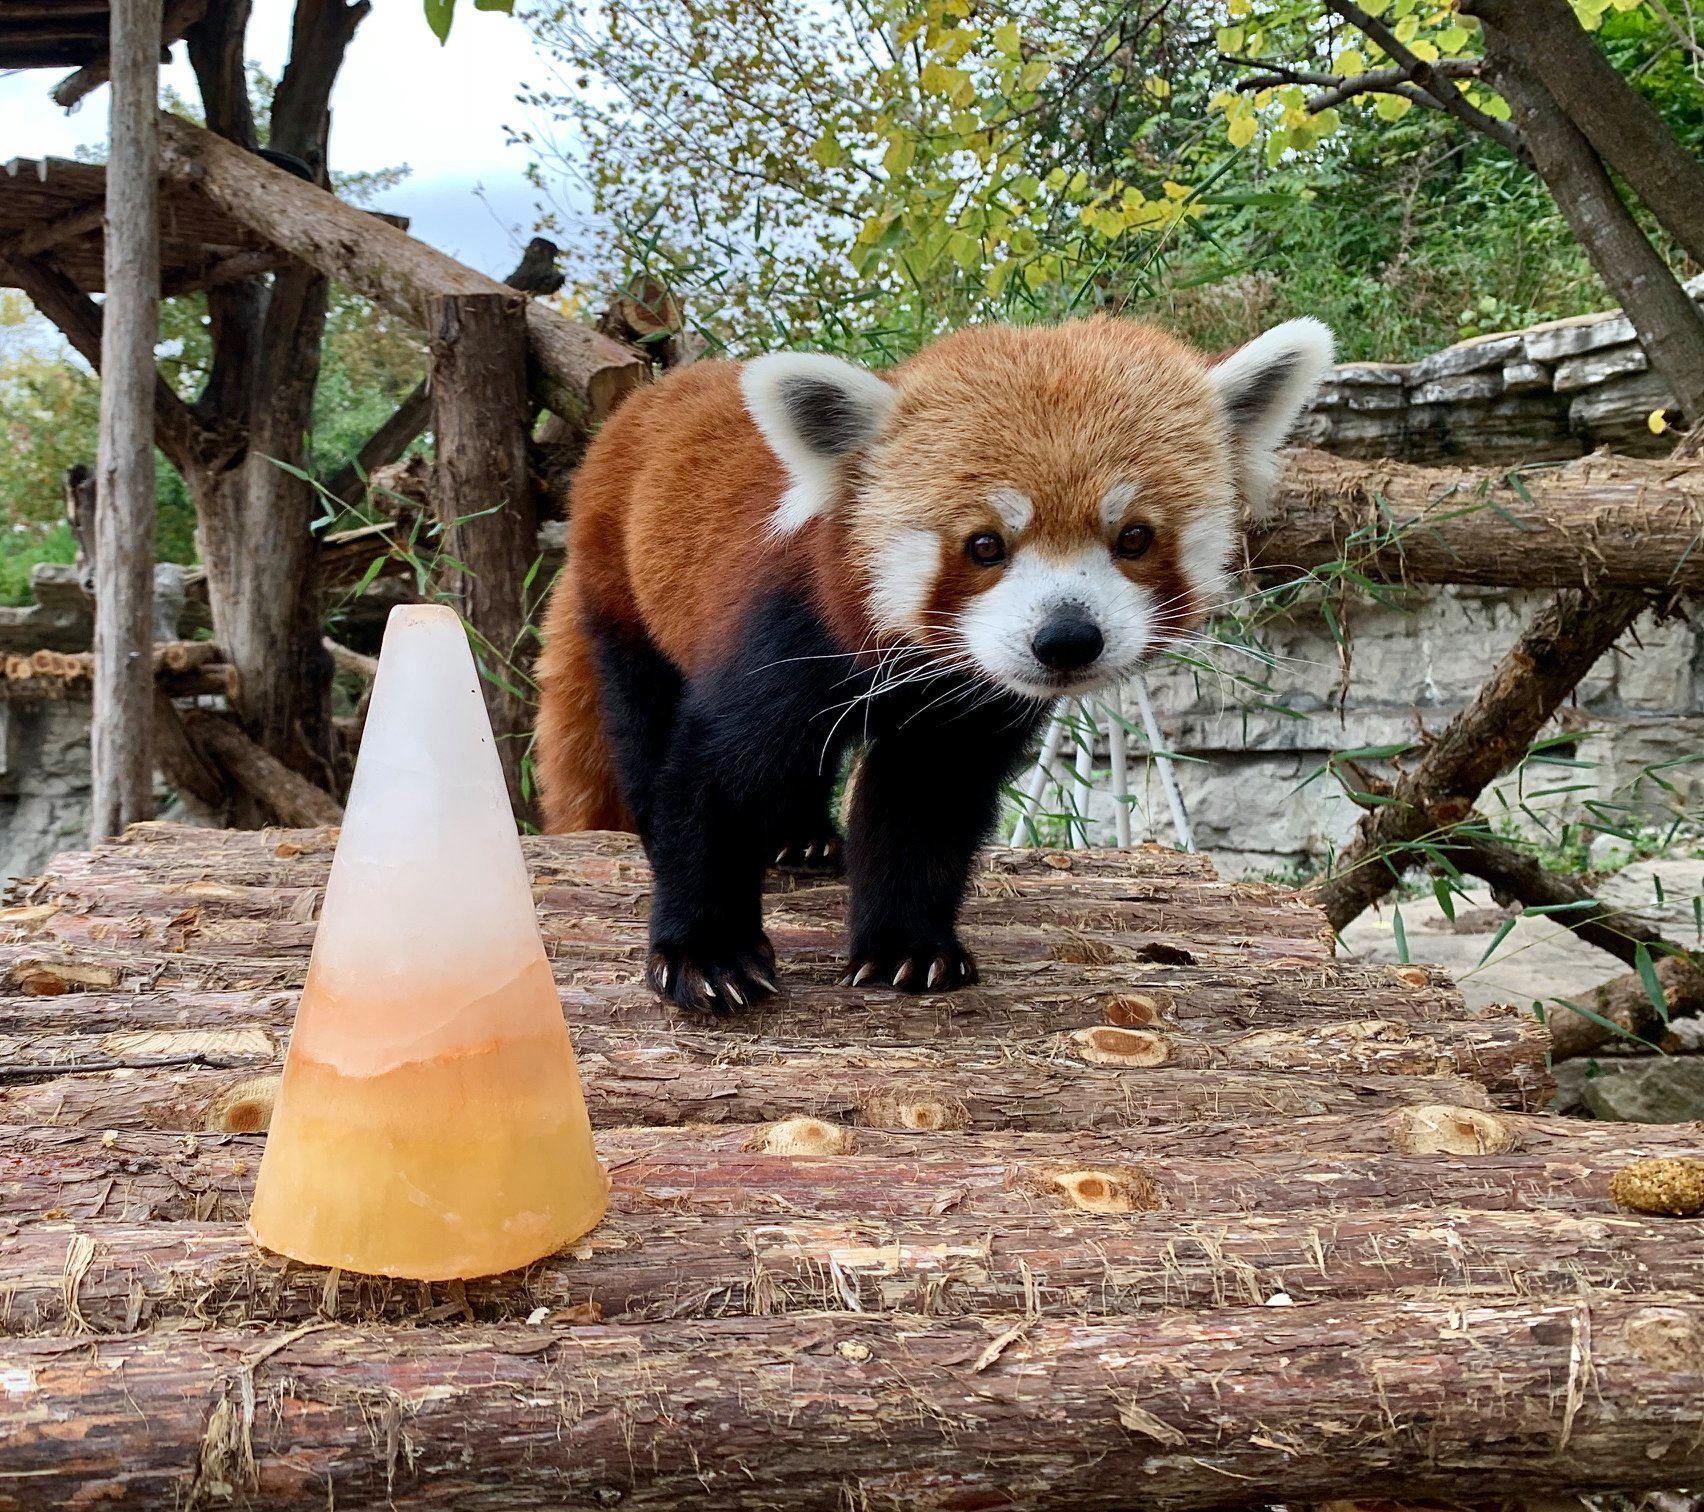 Saint Louis Zoo animals celebrating Halloween